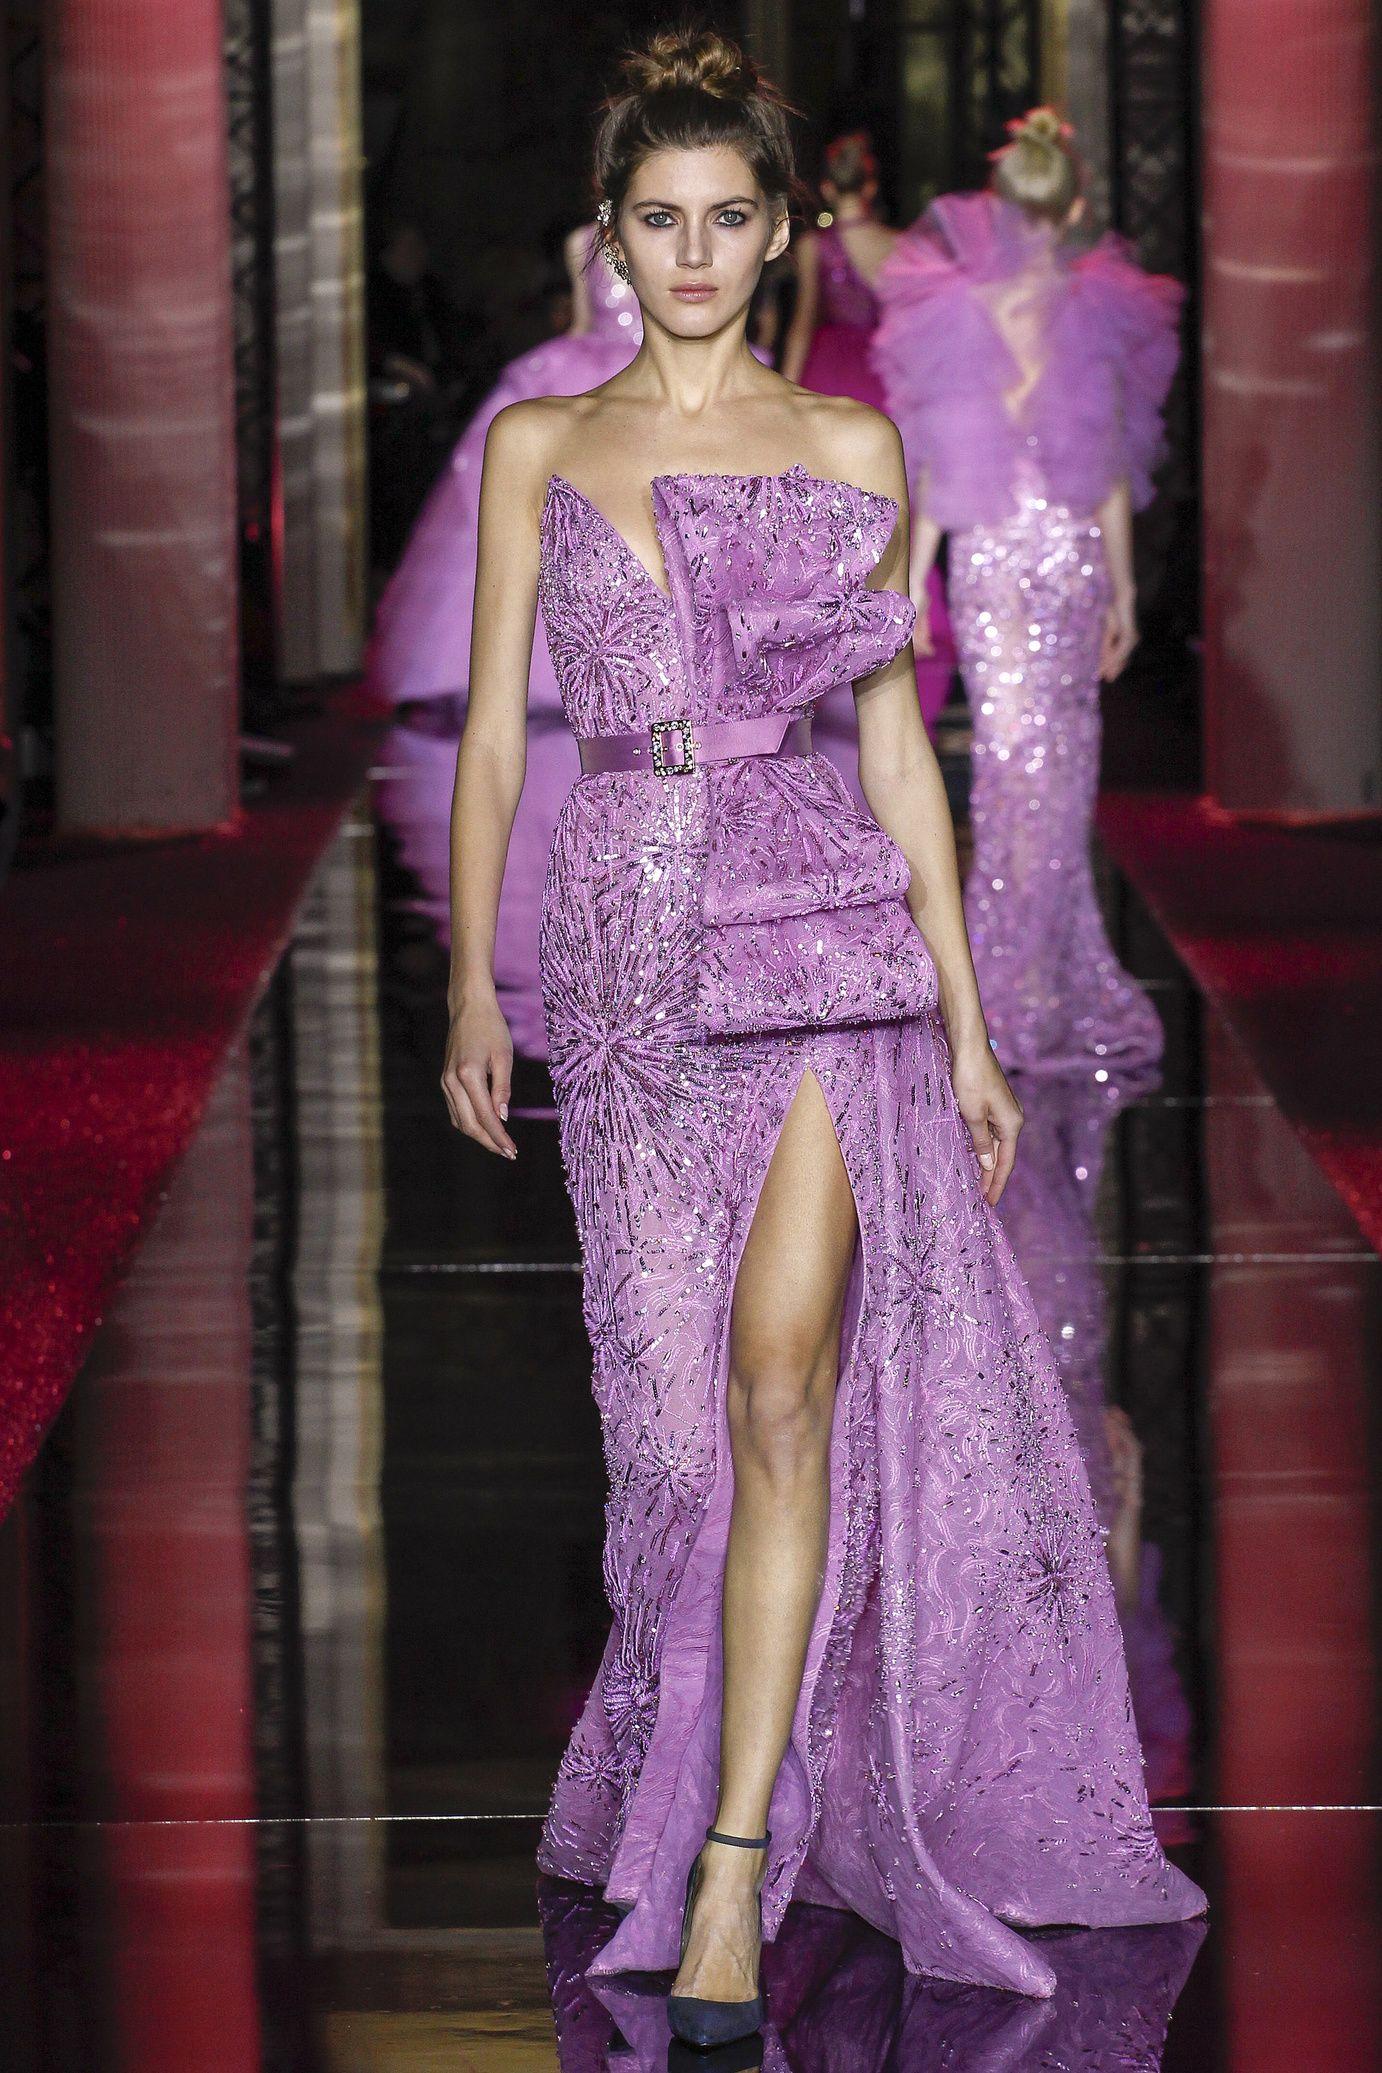 Défilé Zuhair Murad: Haute couture printemps-été 2017 | Zuhair murad ...